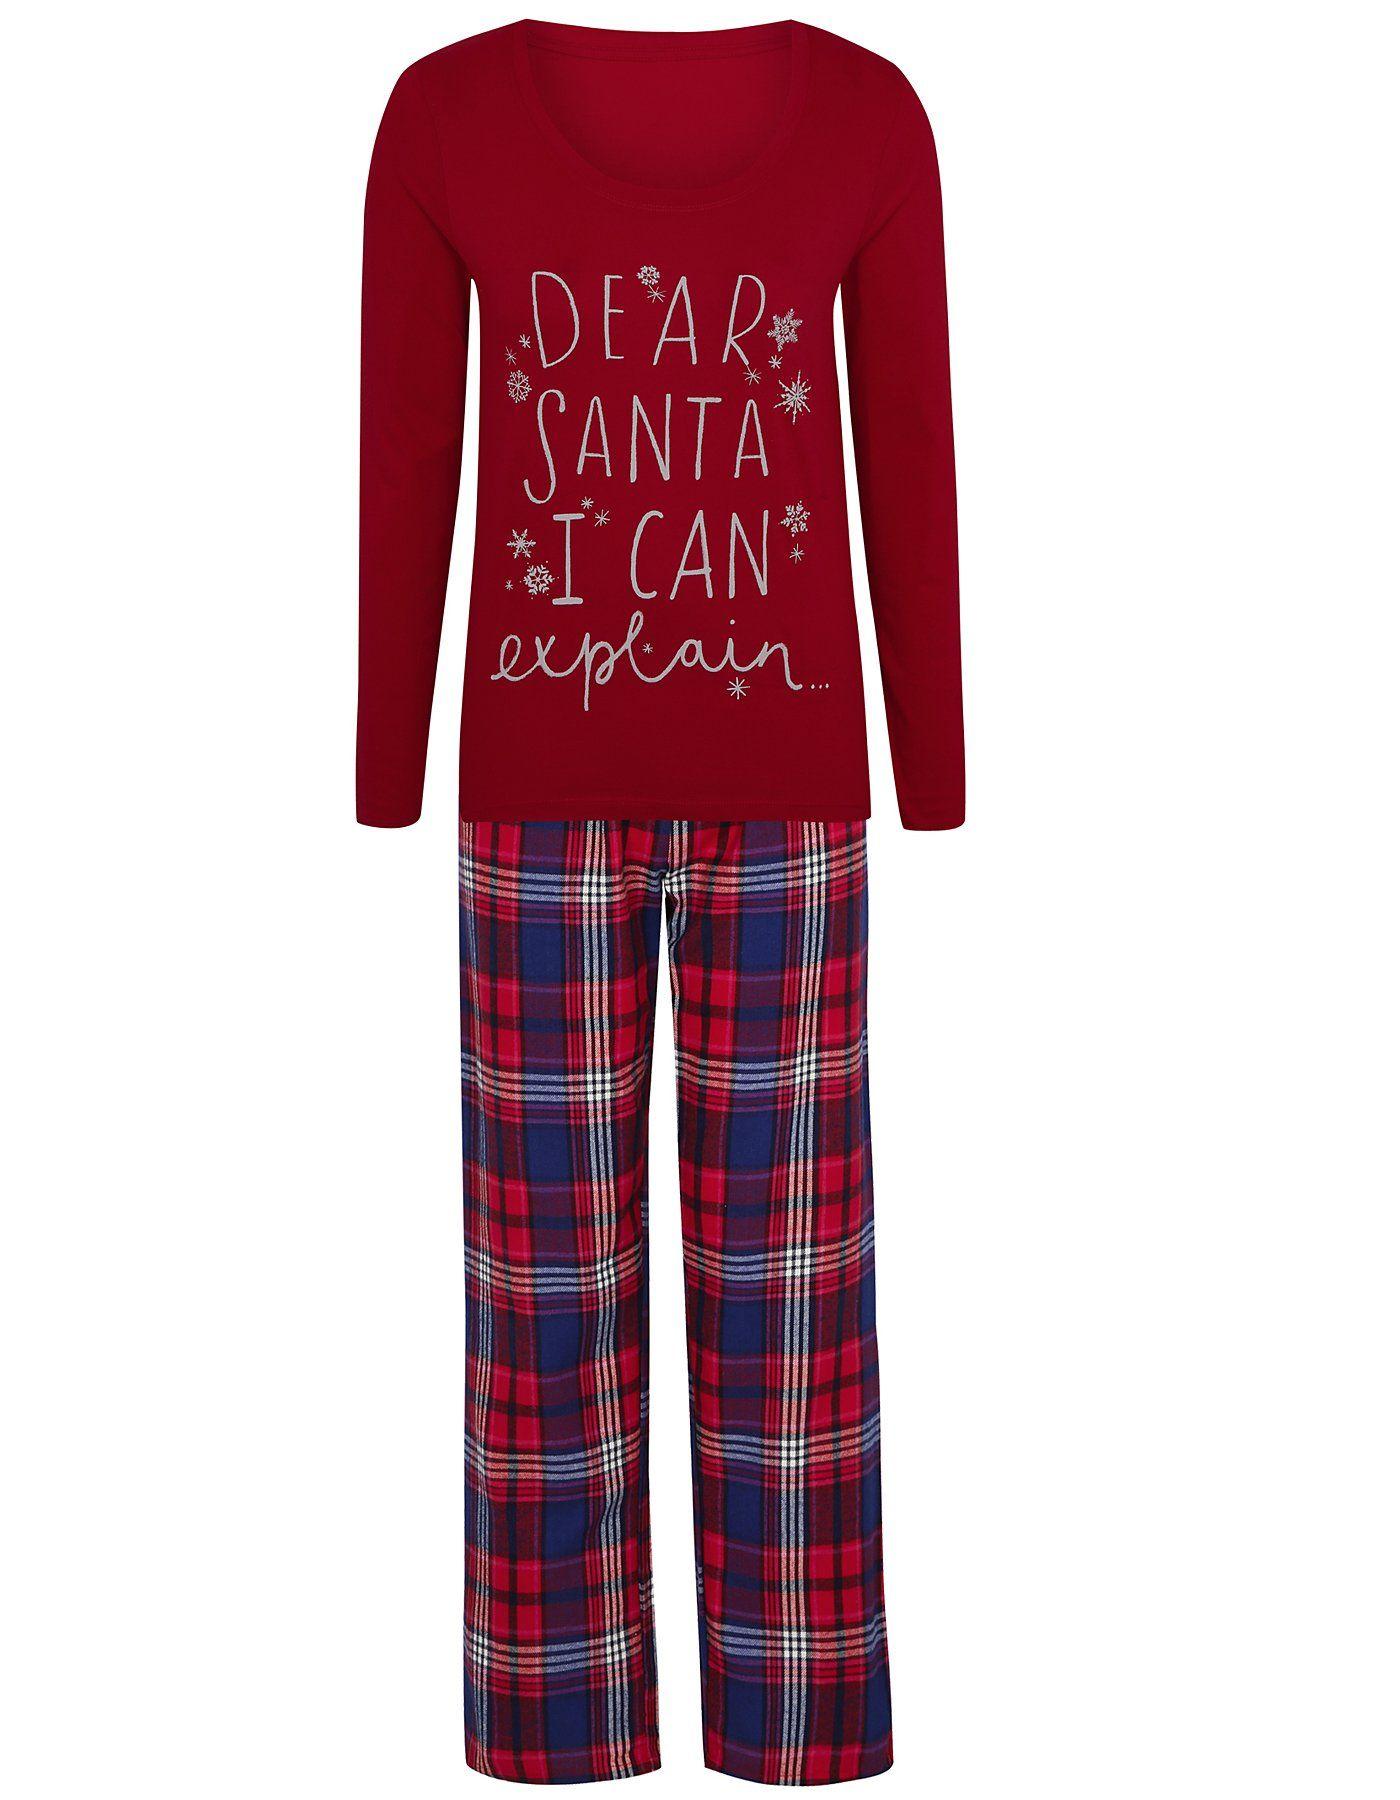 Plus Size Summer Short-sleeved Shorts Plaid Pajama Suit European Mens Cotton Mens Pyjama Sexy Sleepwear Men Pijamas Big Size Profit Small Men's Pajama Sets Men's Sleep & Lounge